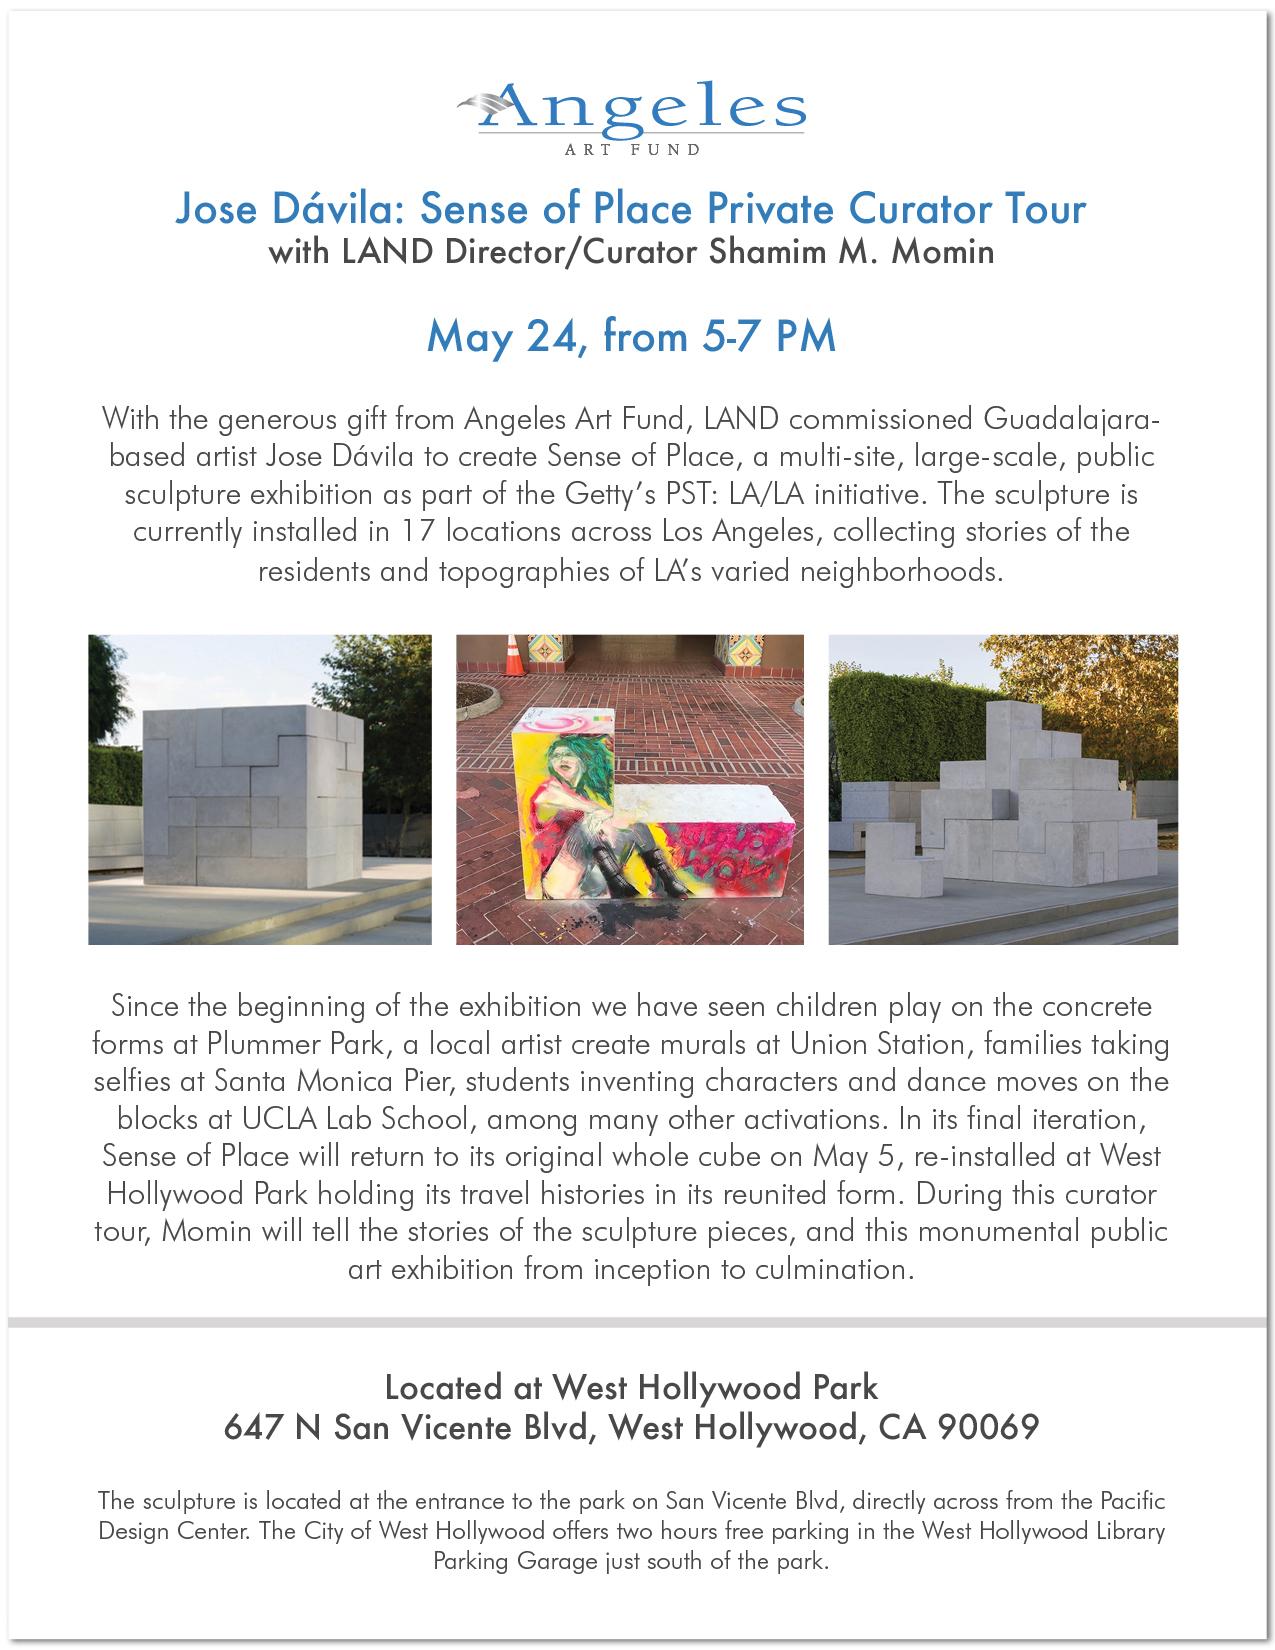 Angeles Art Fund Invites_border11.jpg